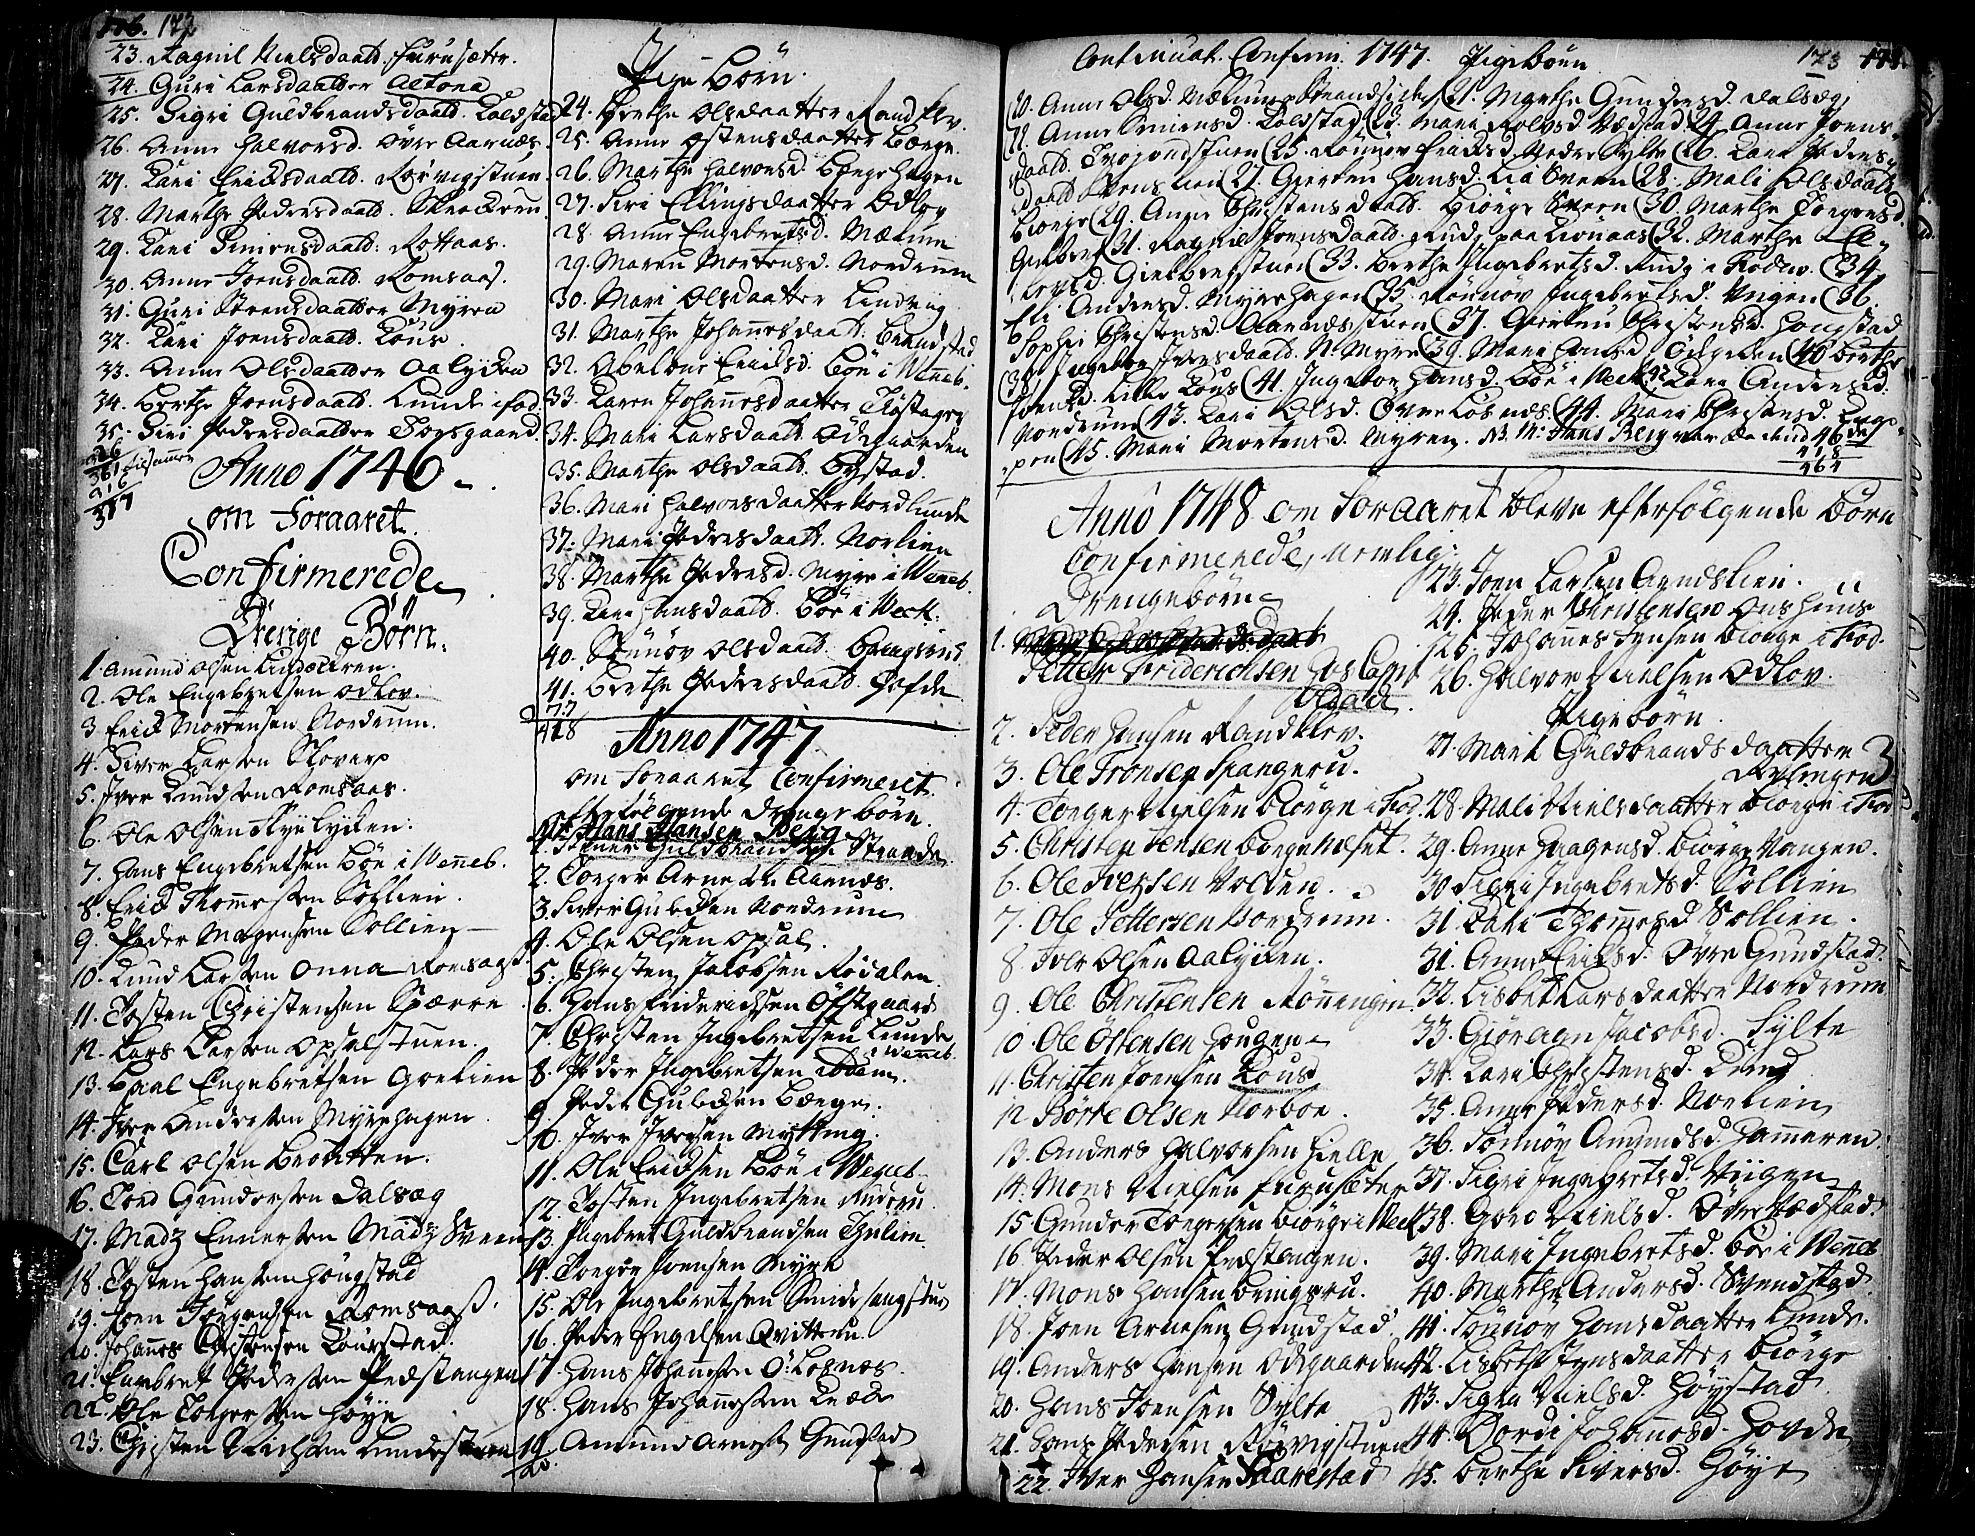 SAH, Ringebu prestekontor, Ministerialbok nr. 2, 1734-1780, s. 172-173